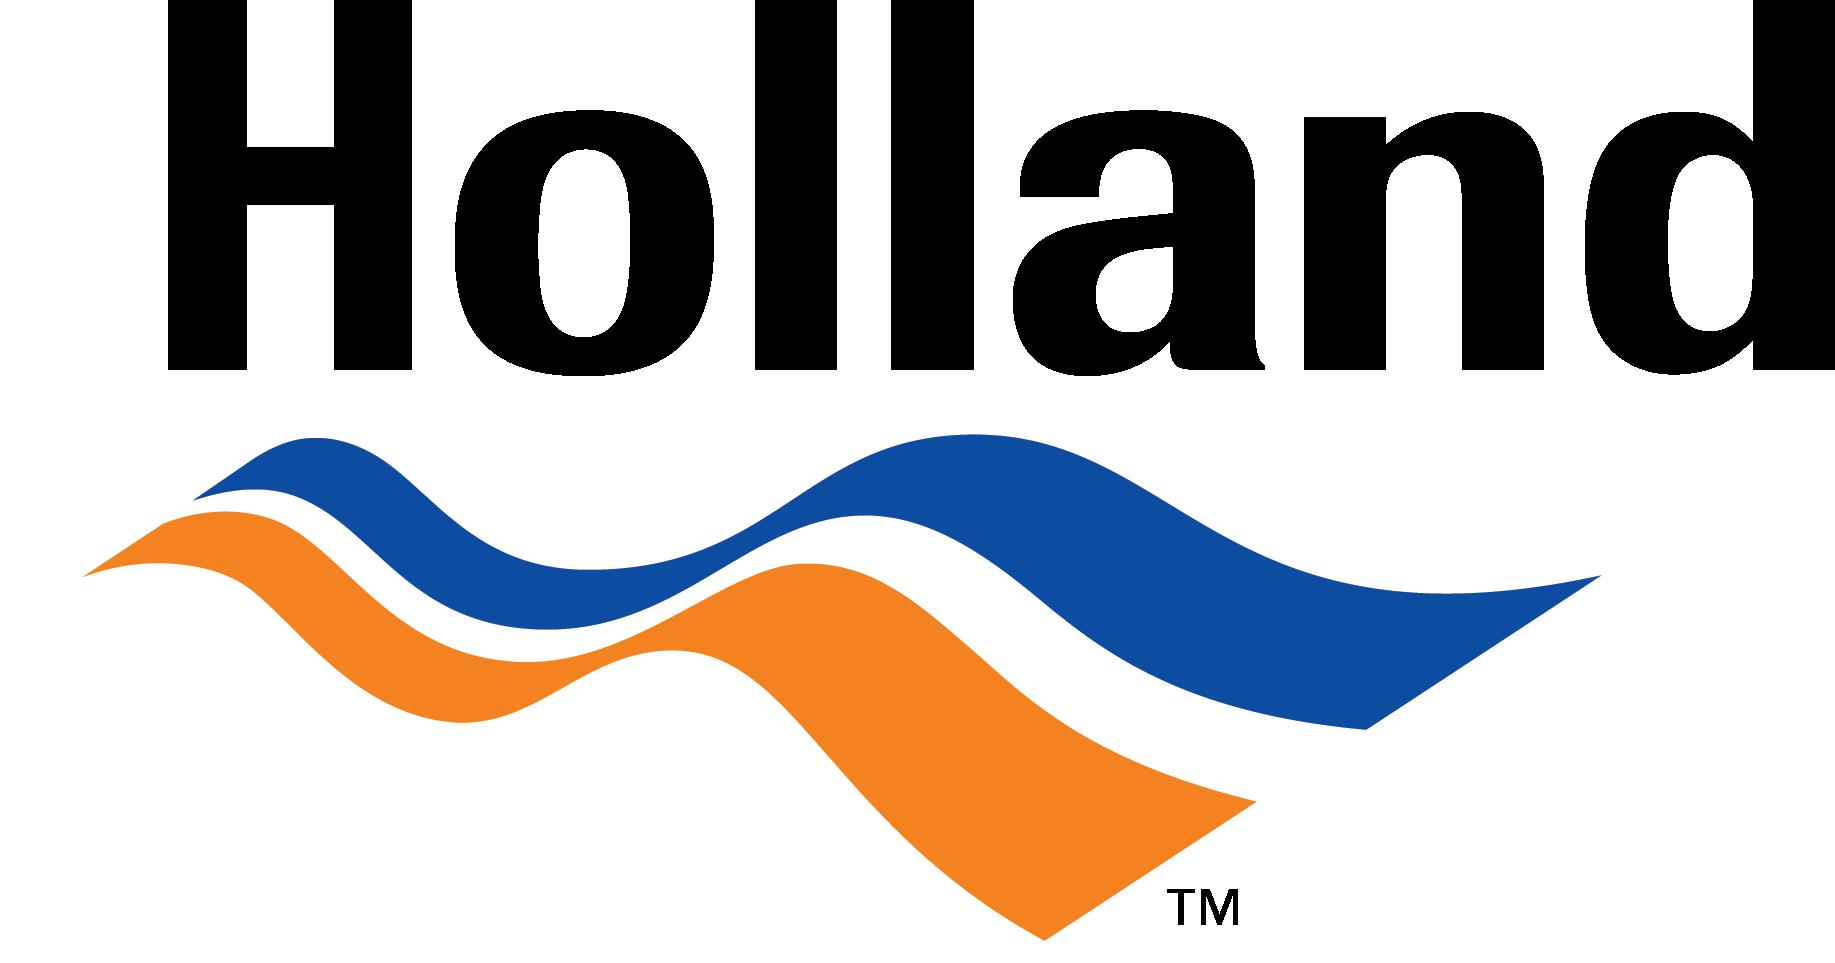 Holland_color_outline.png